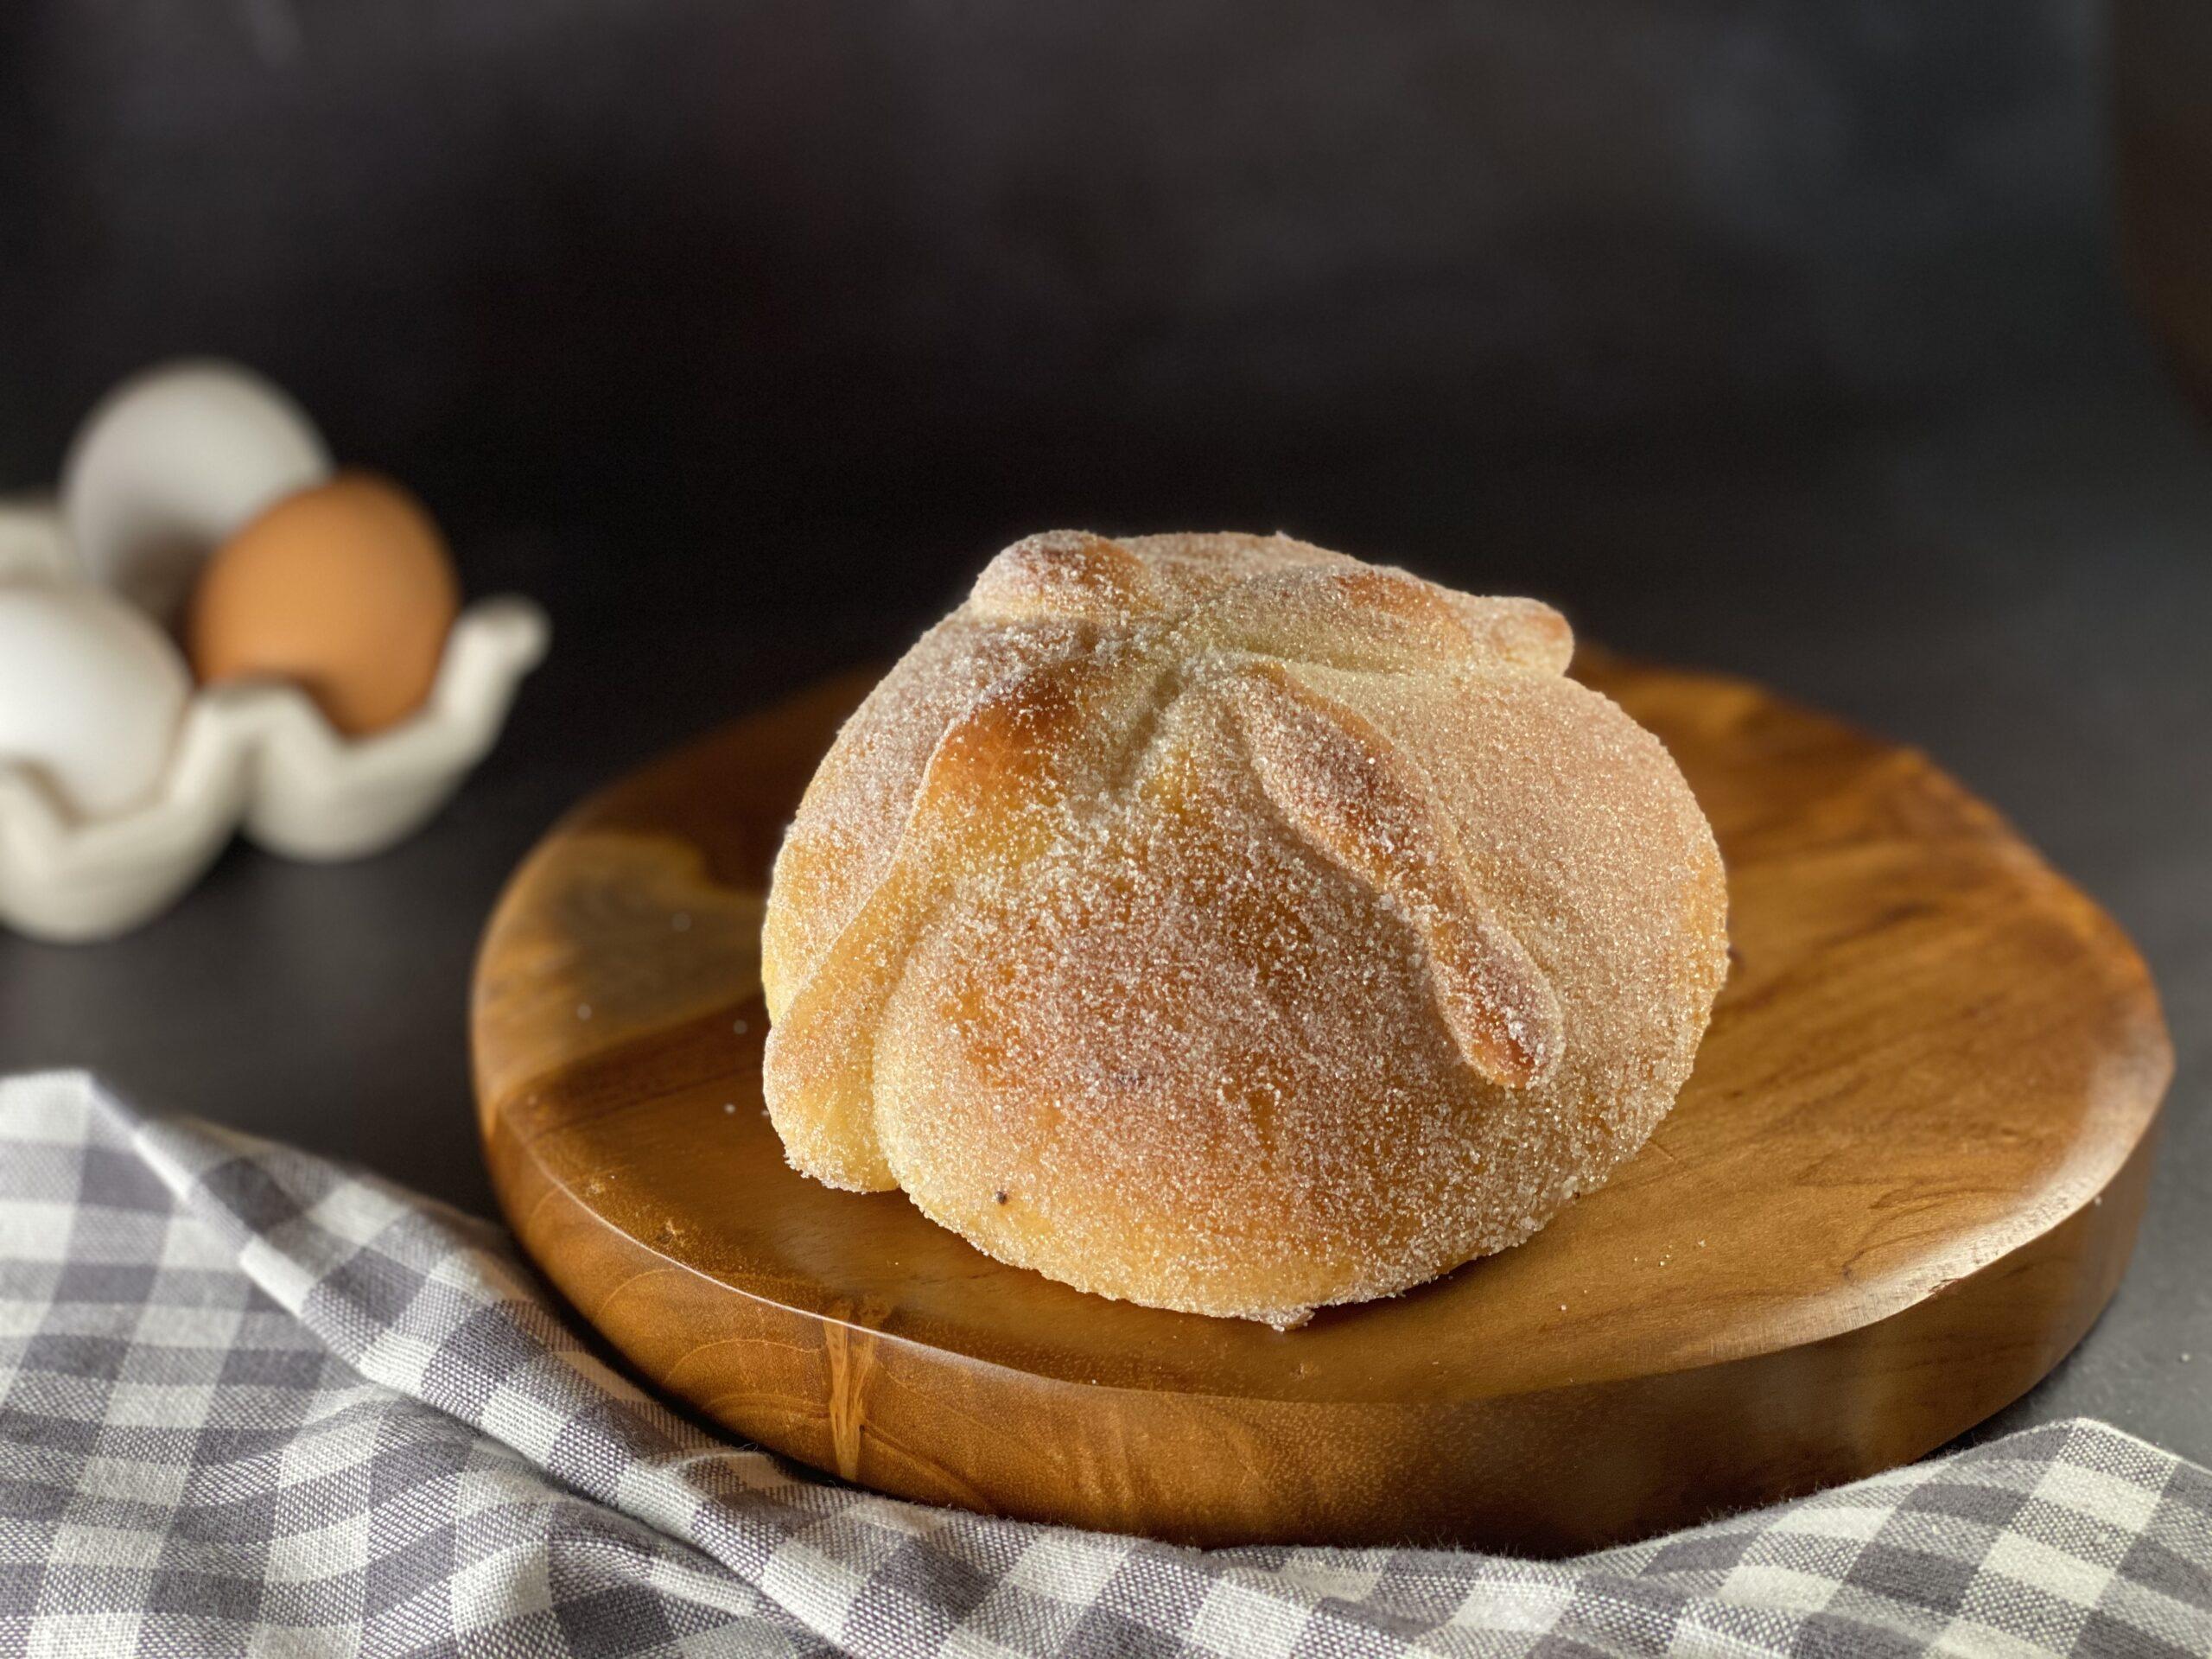 Pan de muerto tradicional